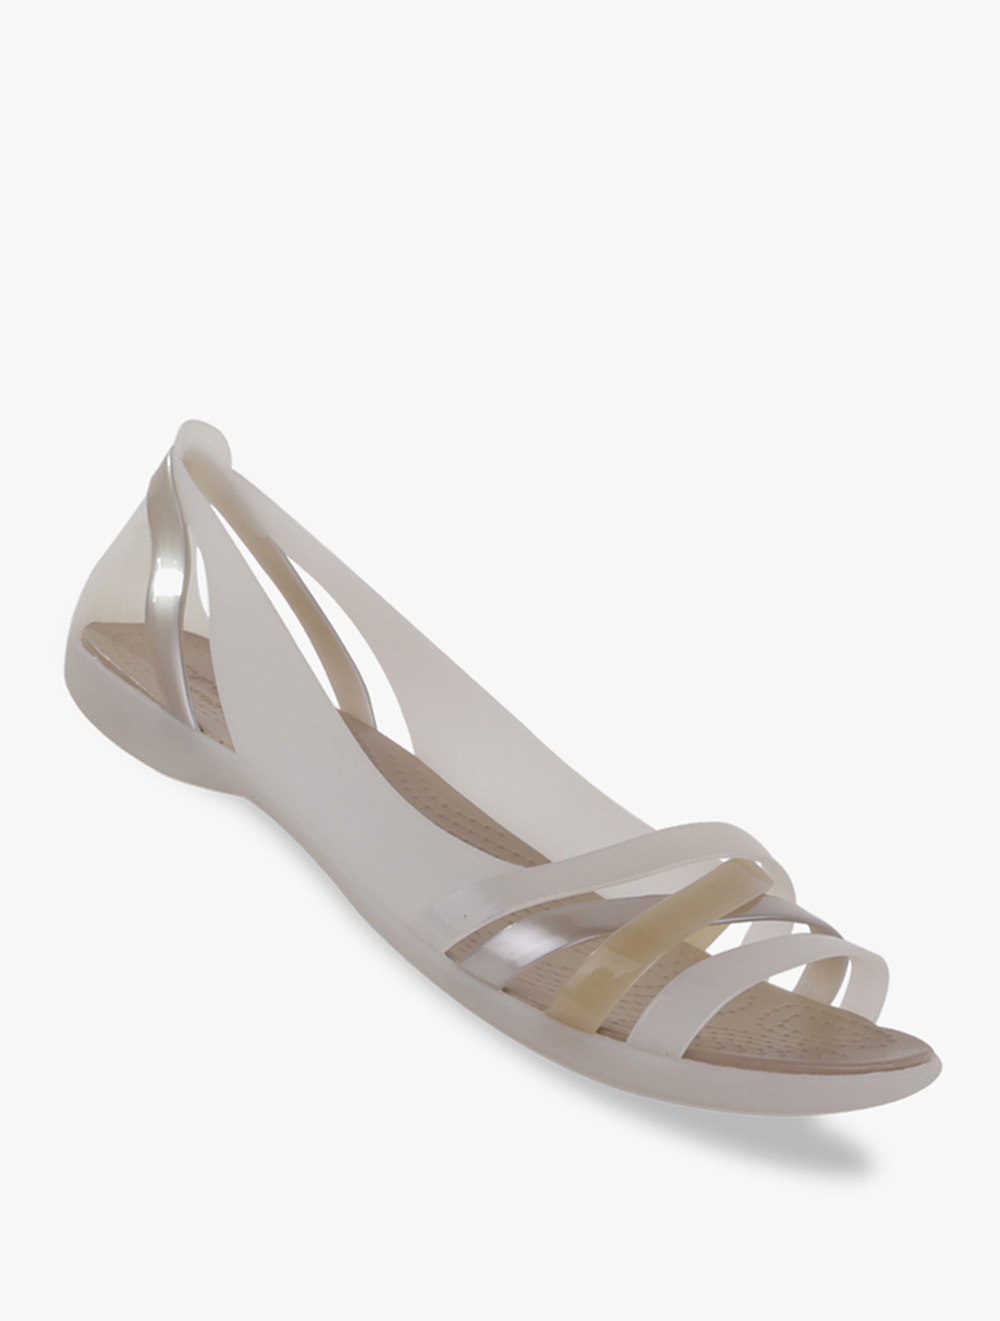 693f107b6d5b Crocs Women s Crocs Isabella Huarache II Flats